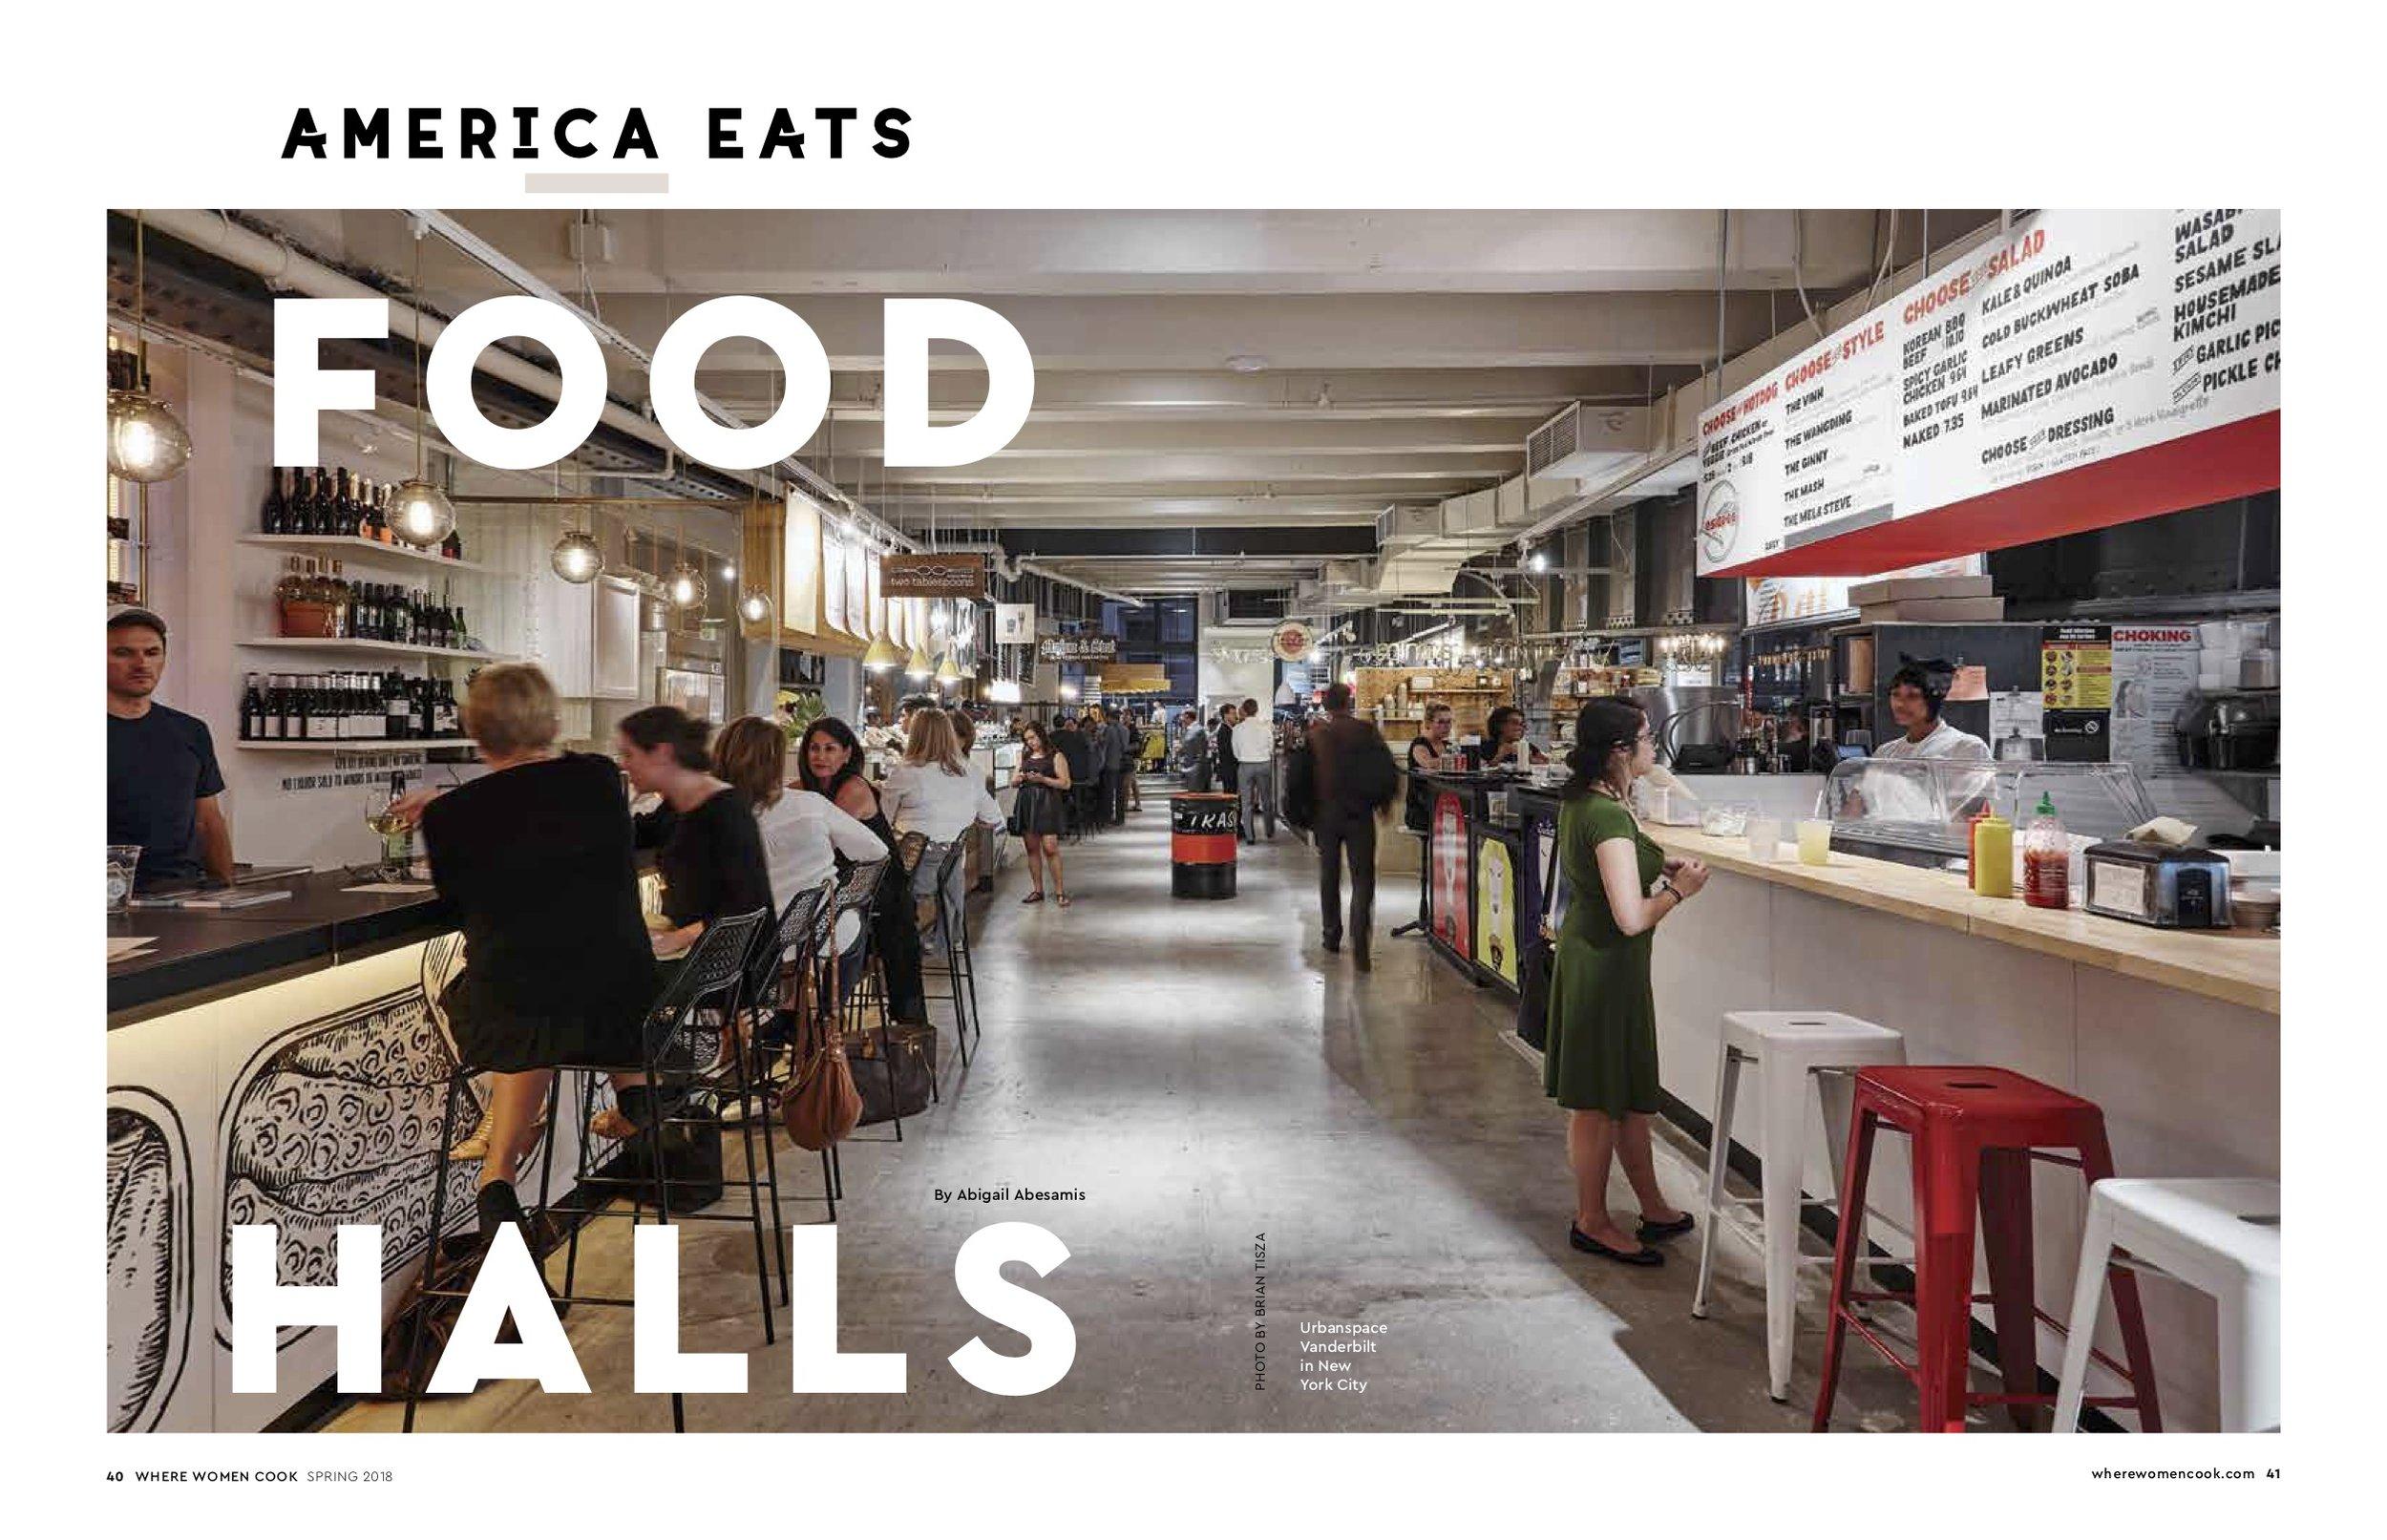 Where Women Cook_Food Halls.jpg